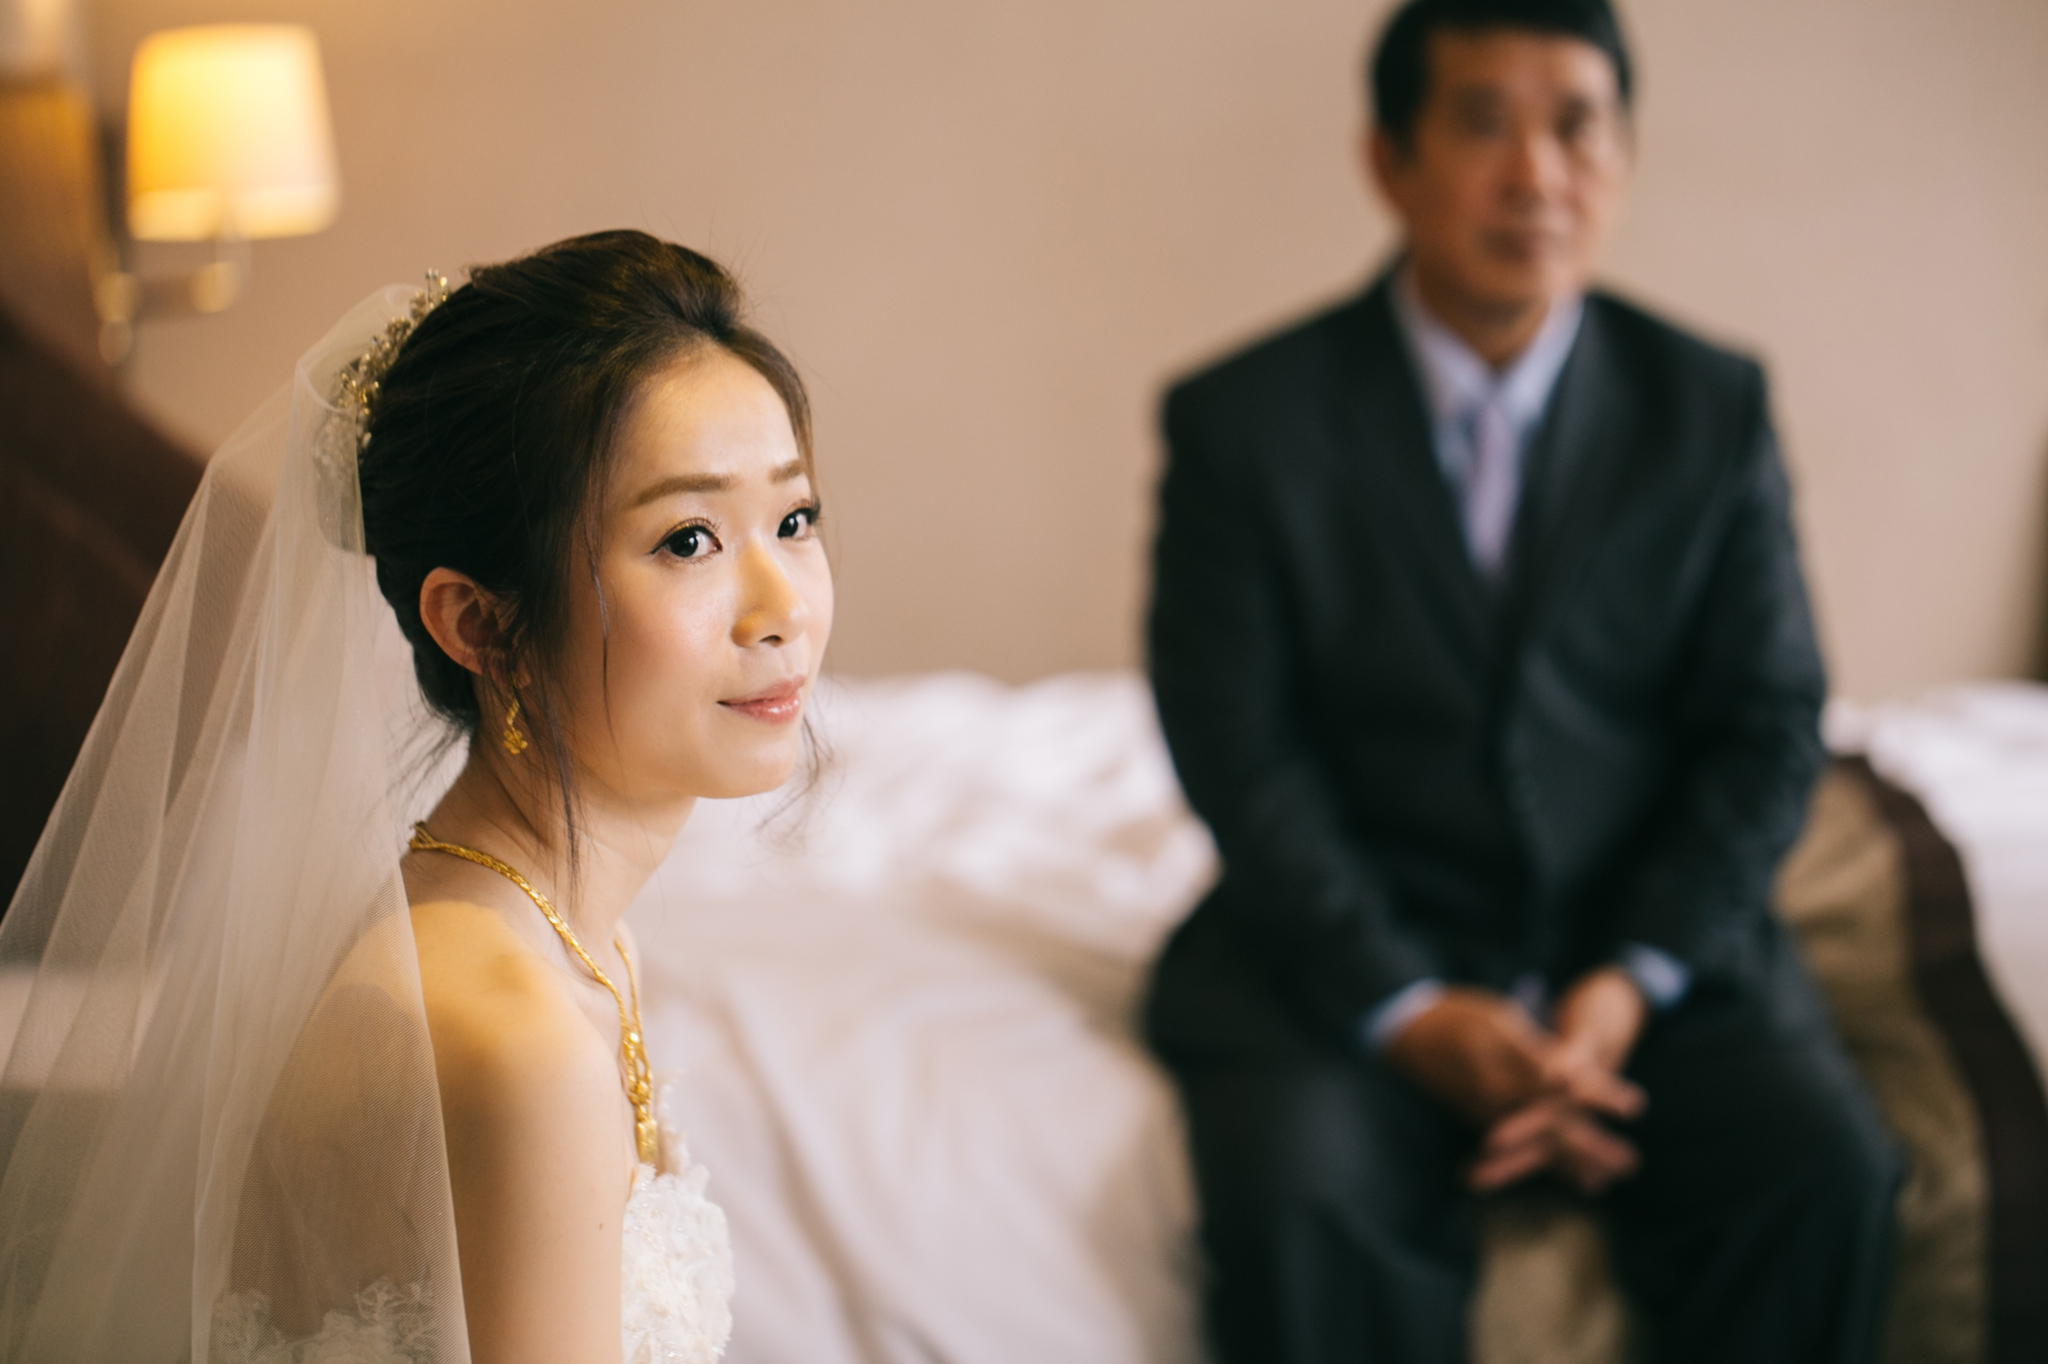 Tina+Nash-wedding-台北婚禮迎娶晚宴-新莊終身大事-045.jpg